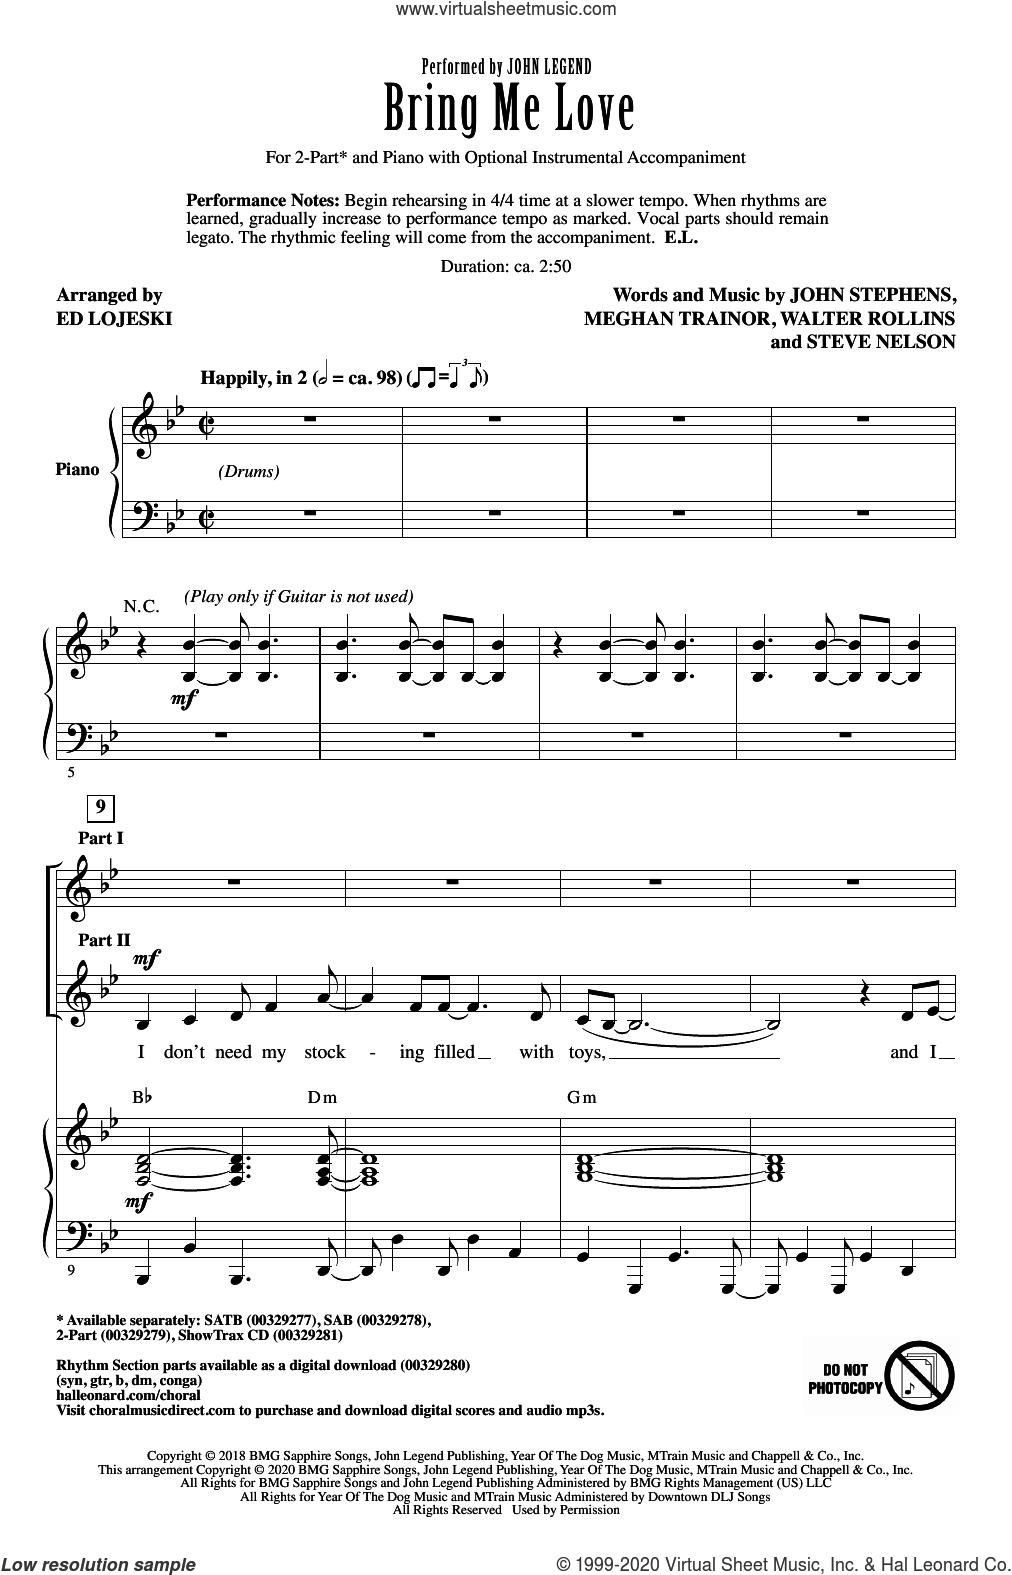 Bring Me Love (arr. Ed Lojeski) sheet music for choir (2-Part) by John Legend, Ed Lojeski, John Stephens, Meghan Trainor, Steve Nelson and Walter Rollins, intermediate duet